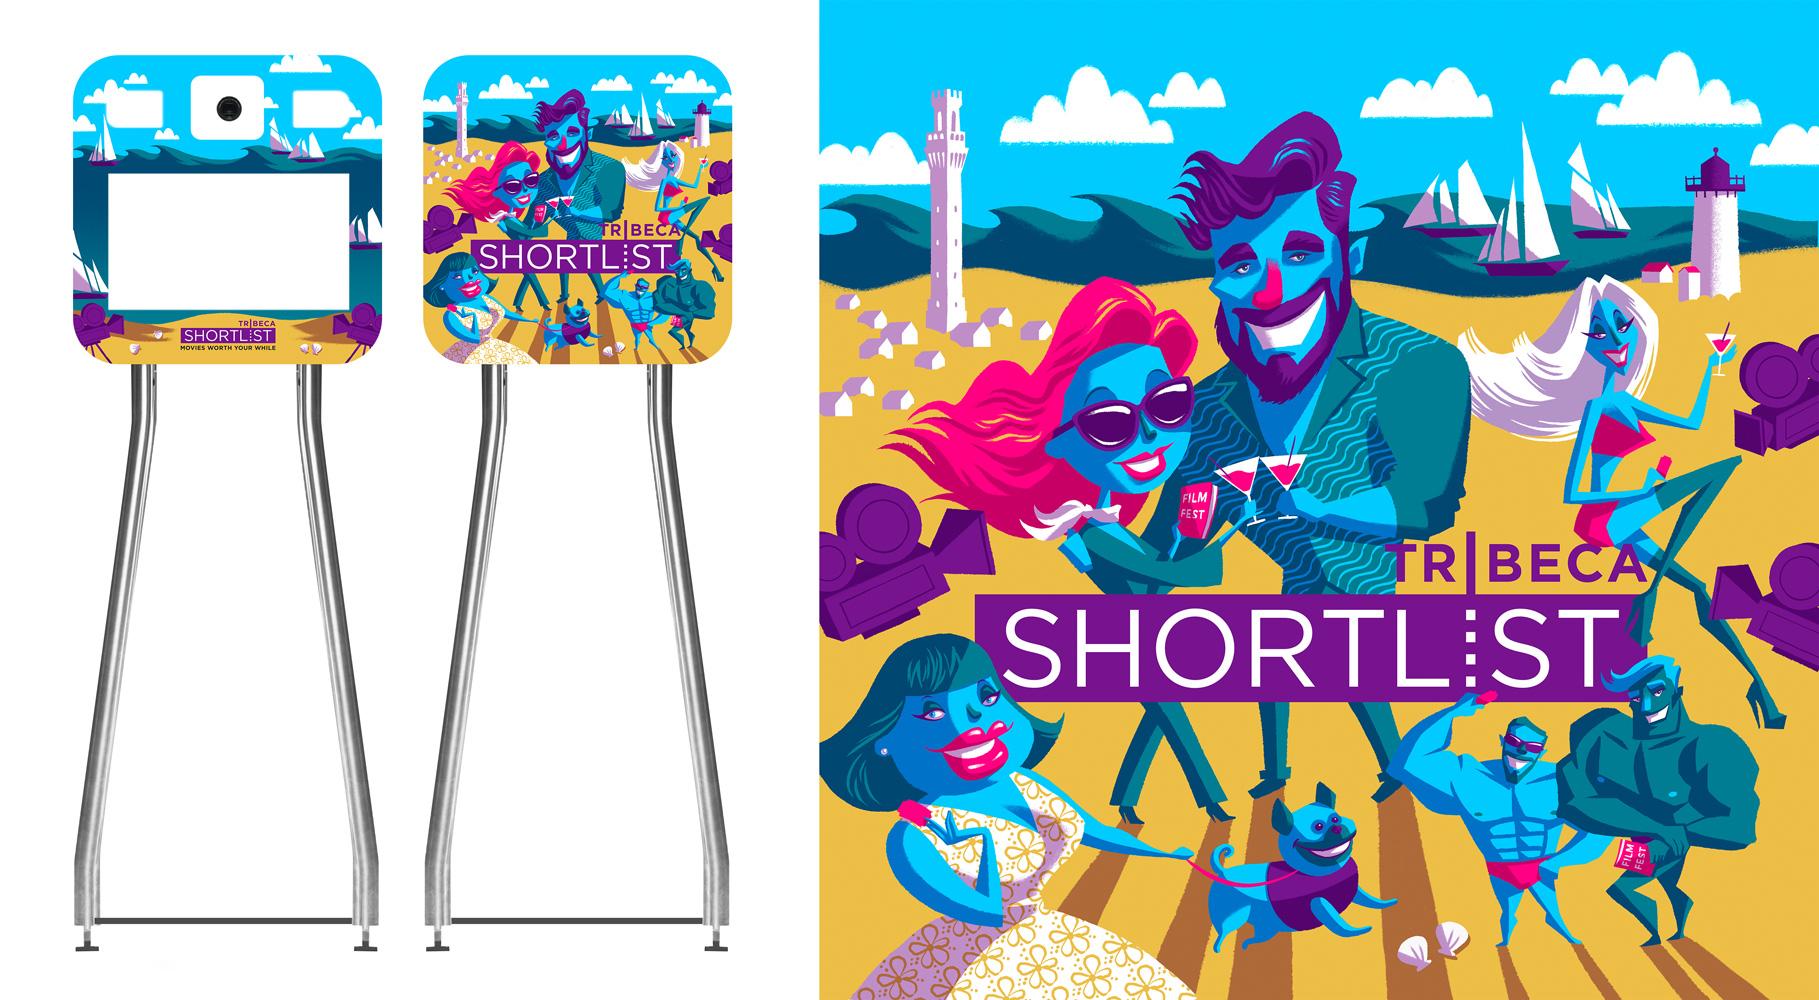 Tribeca Shortlist Sharing Box